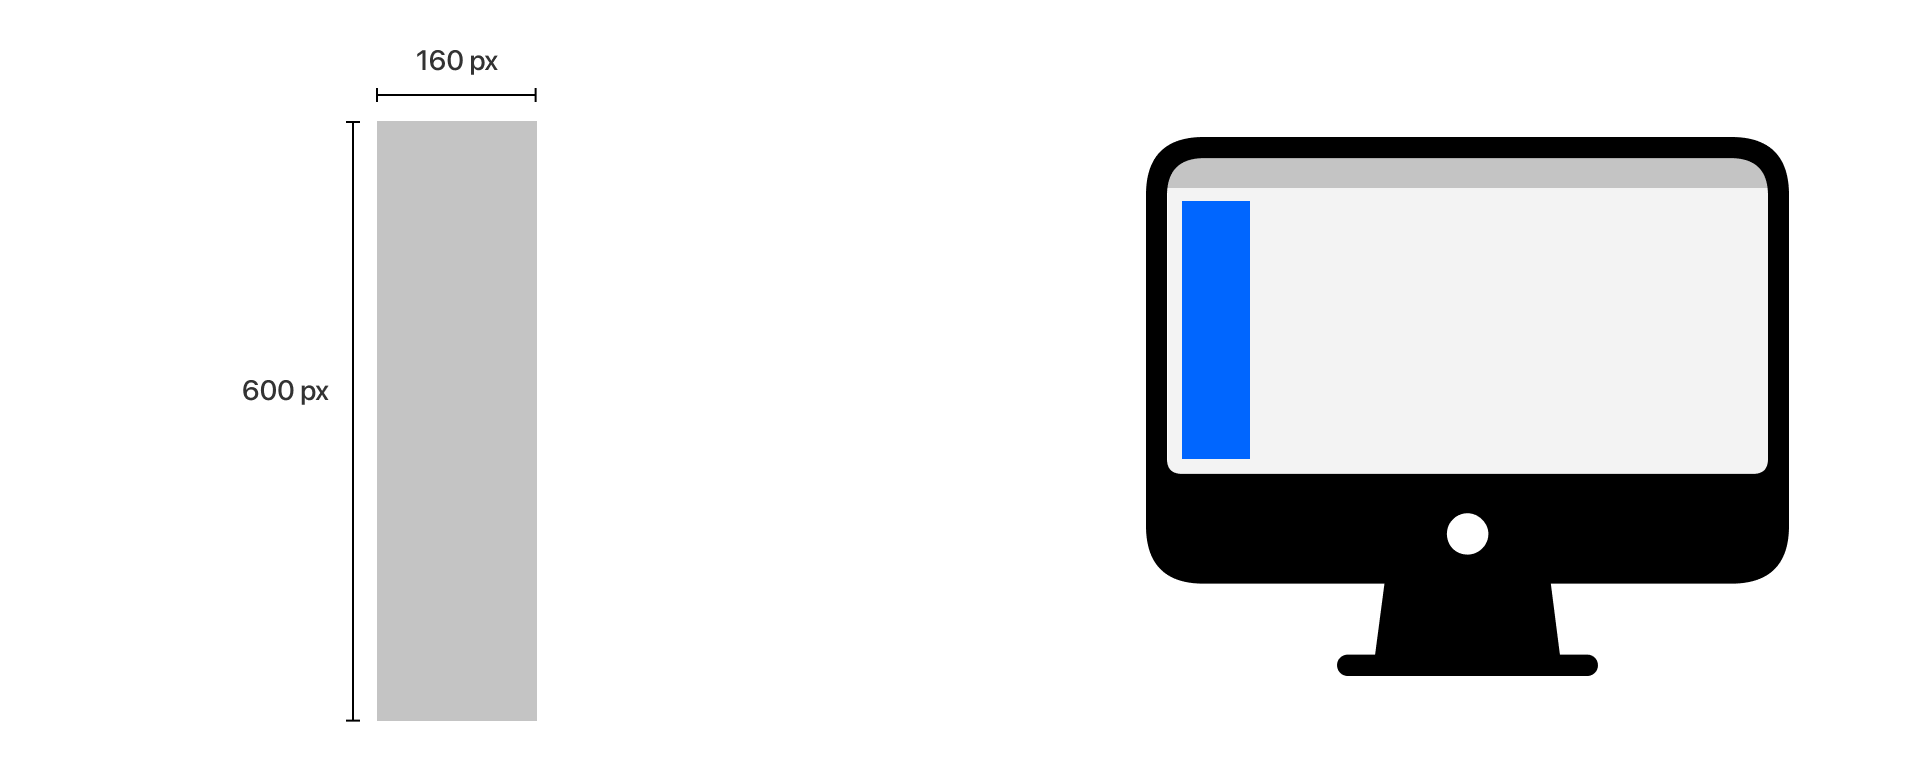 desktop wide skyscraper web banner dimensions